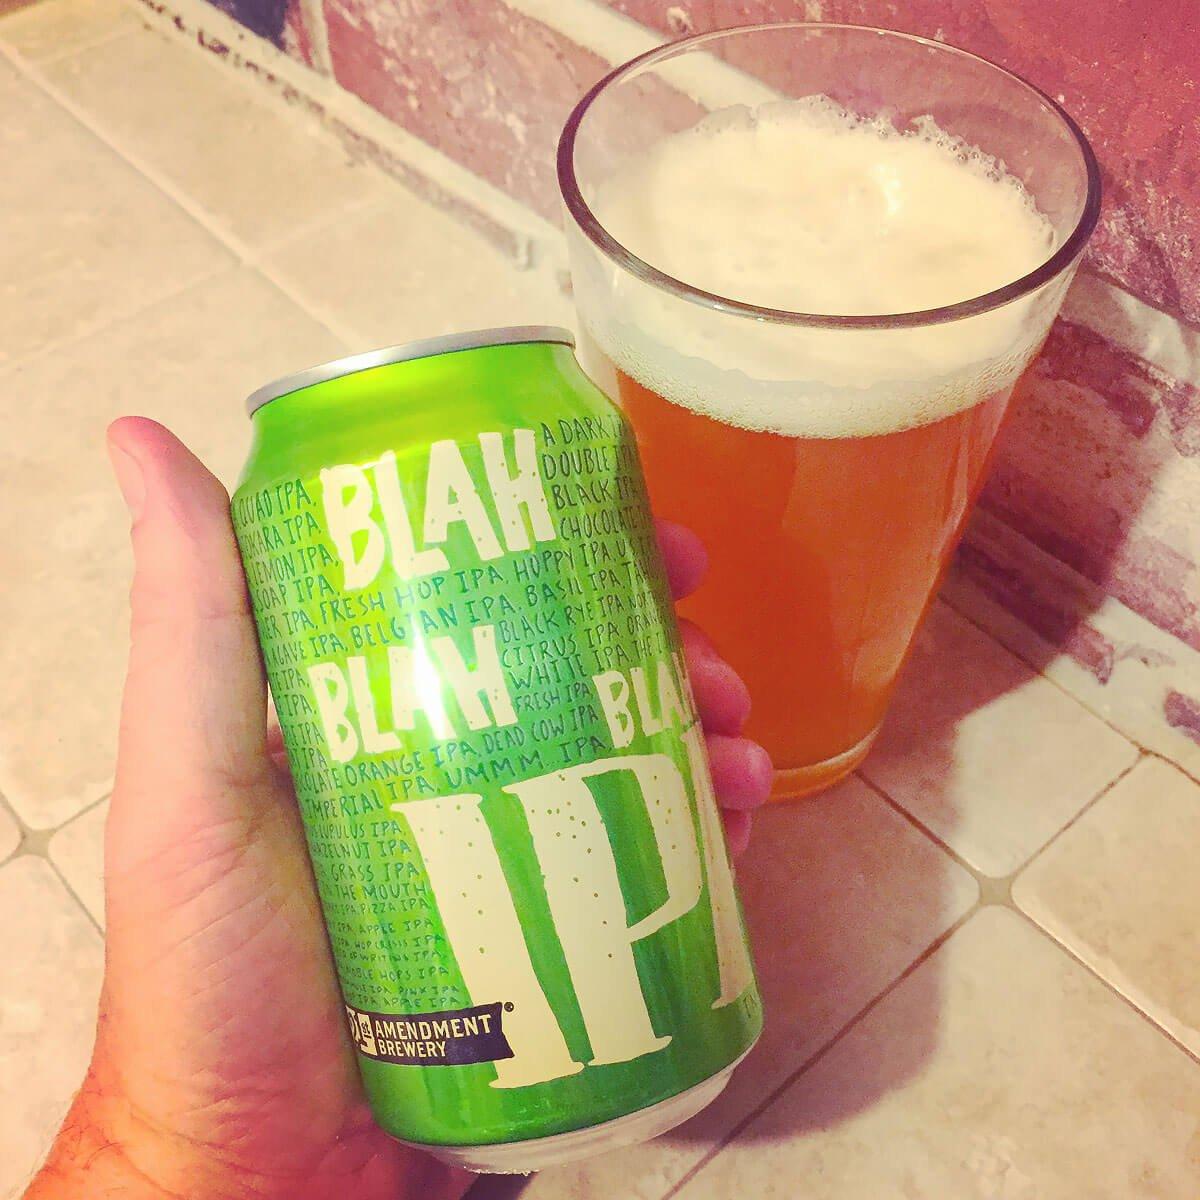 Blah Blah Blah IPA, an American Double IPA by 21st Amendment Brewery